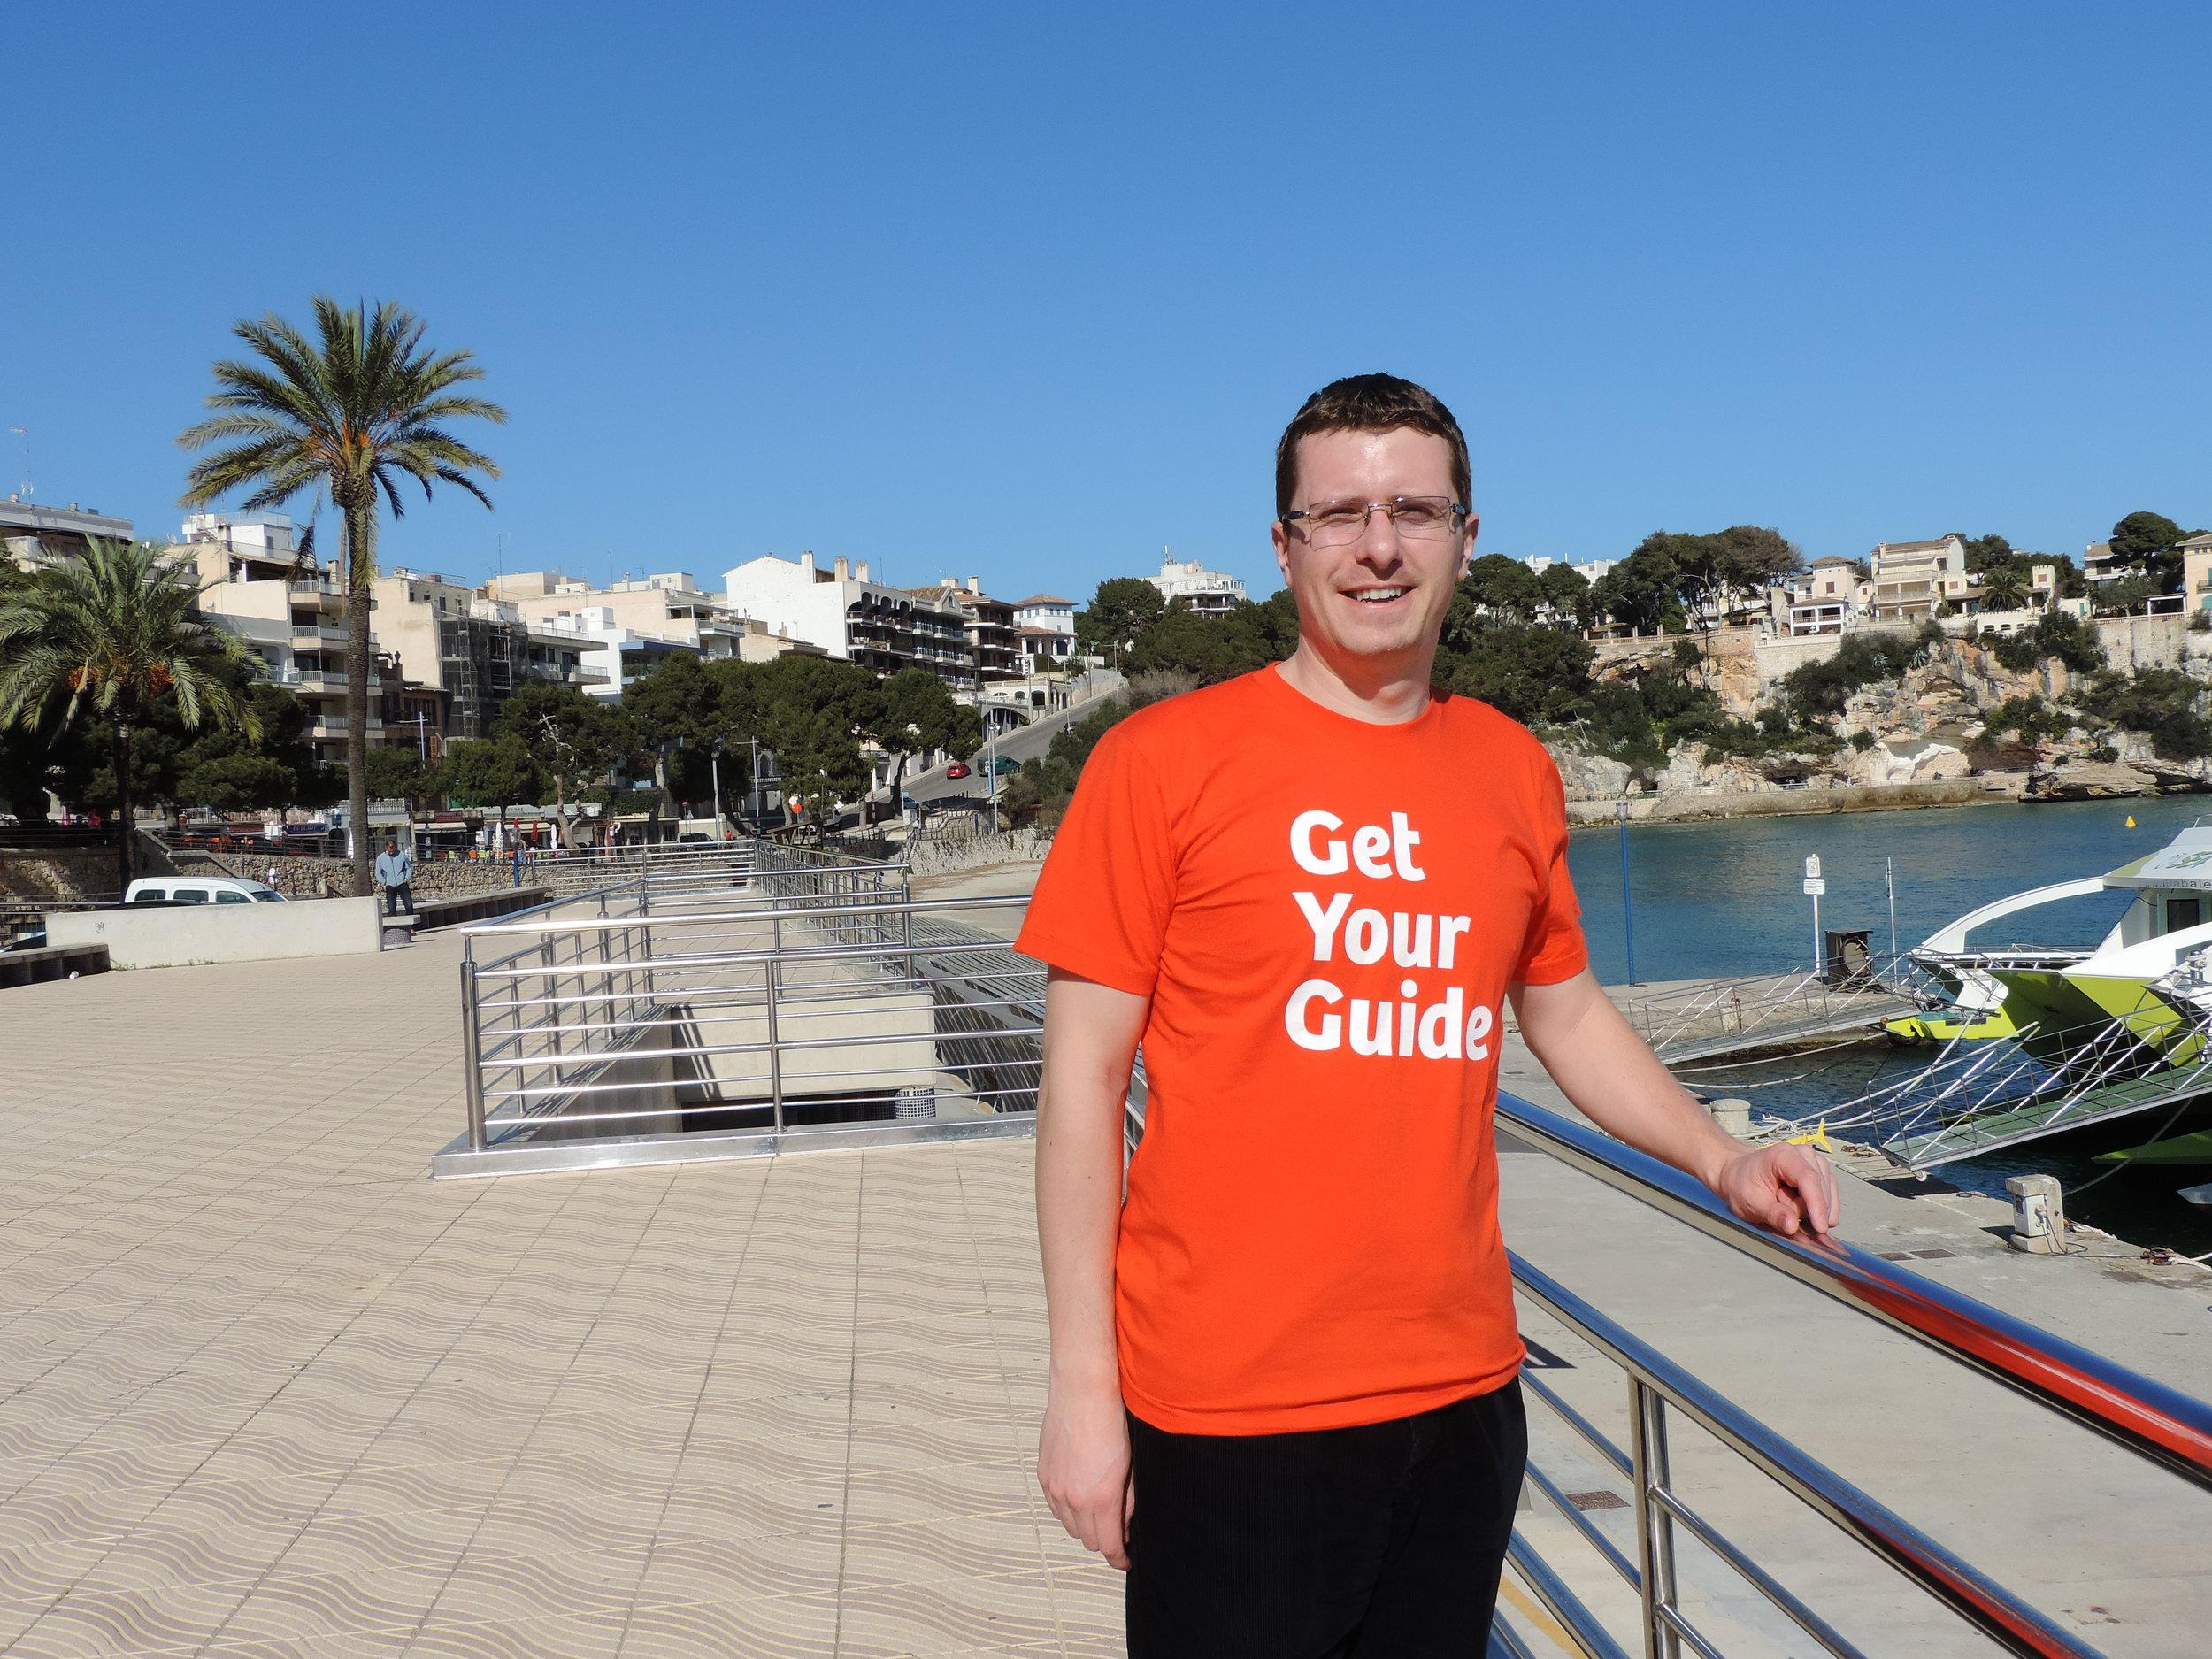 Marius Mazgalici enjoying the sun in Mallorca!